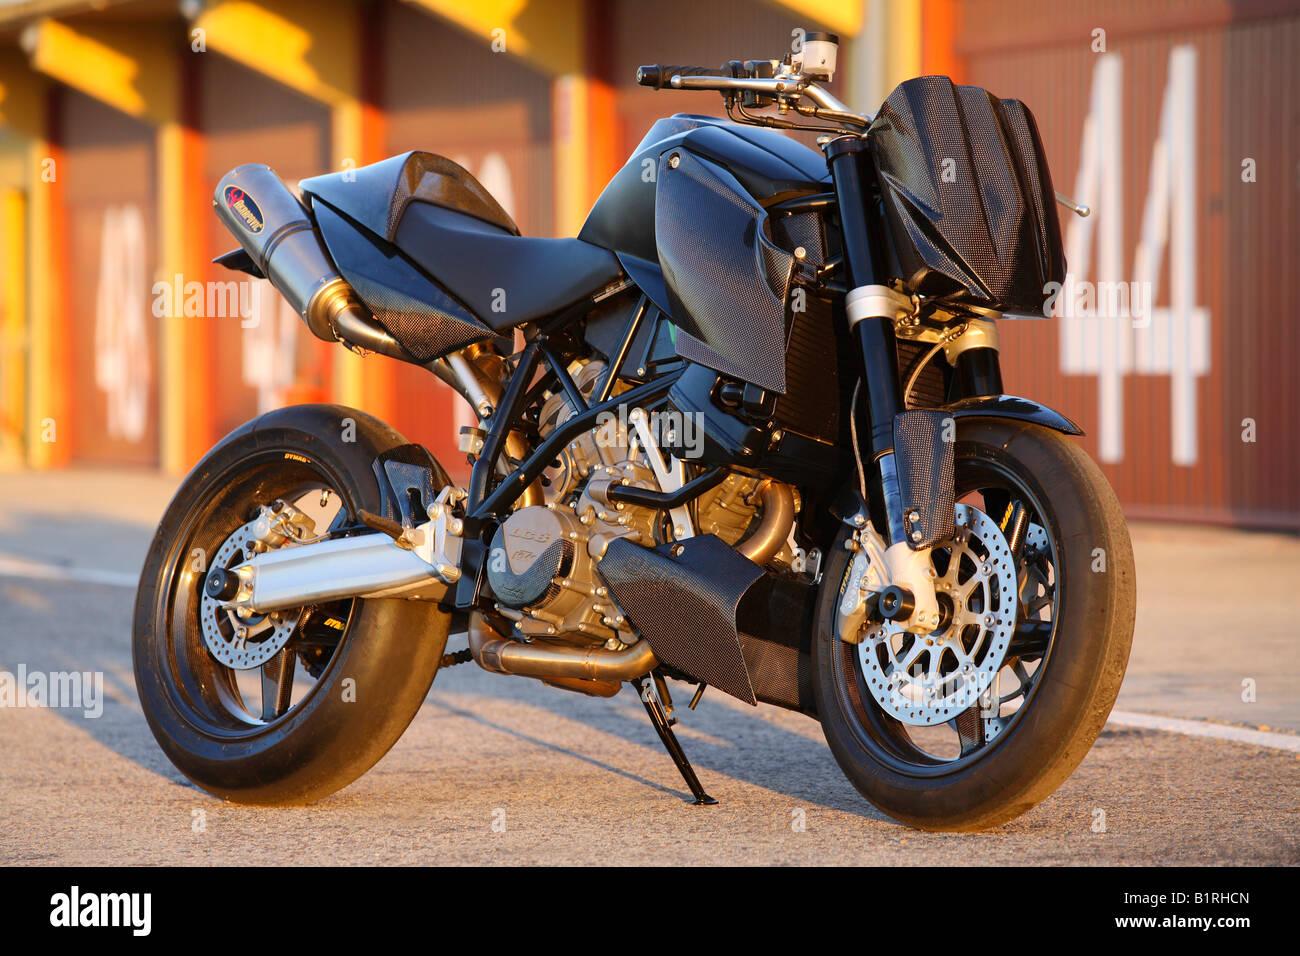 Motorbike KTM Superduke R   Stock Image